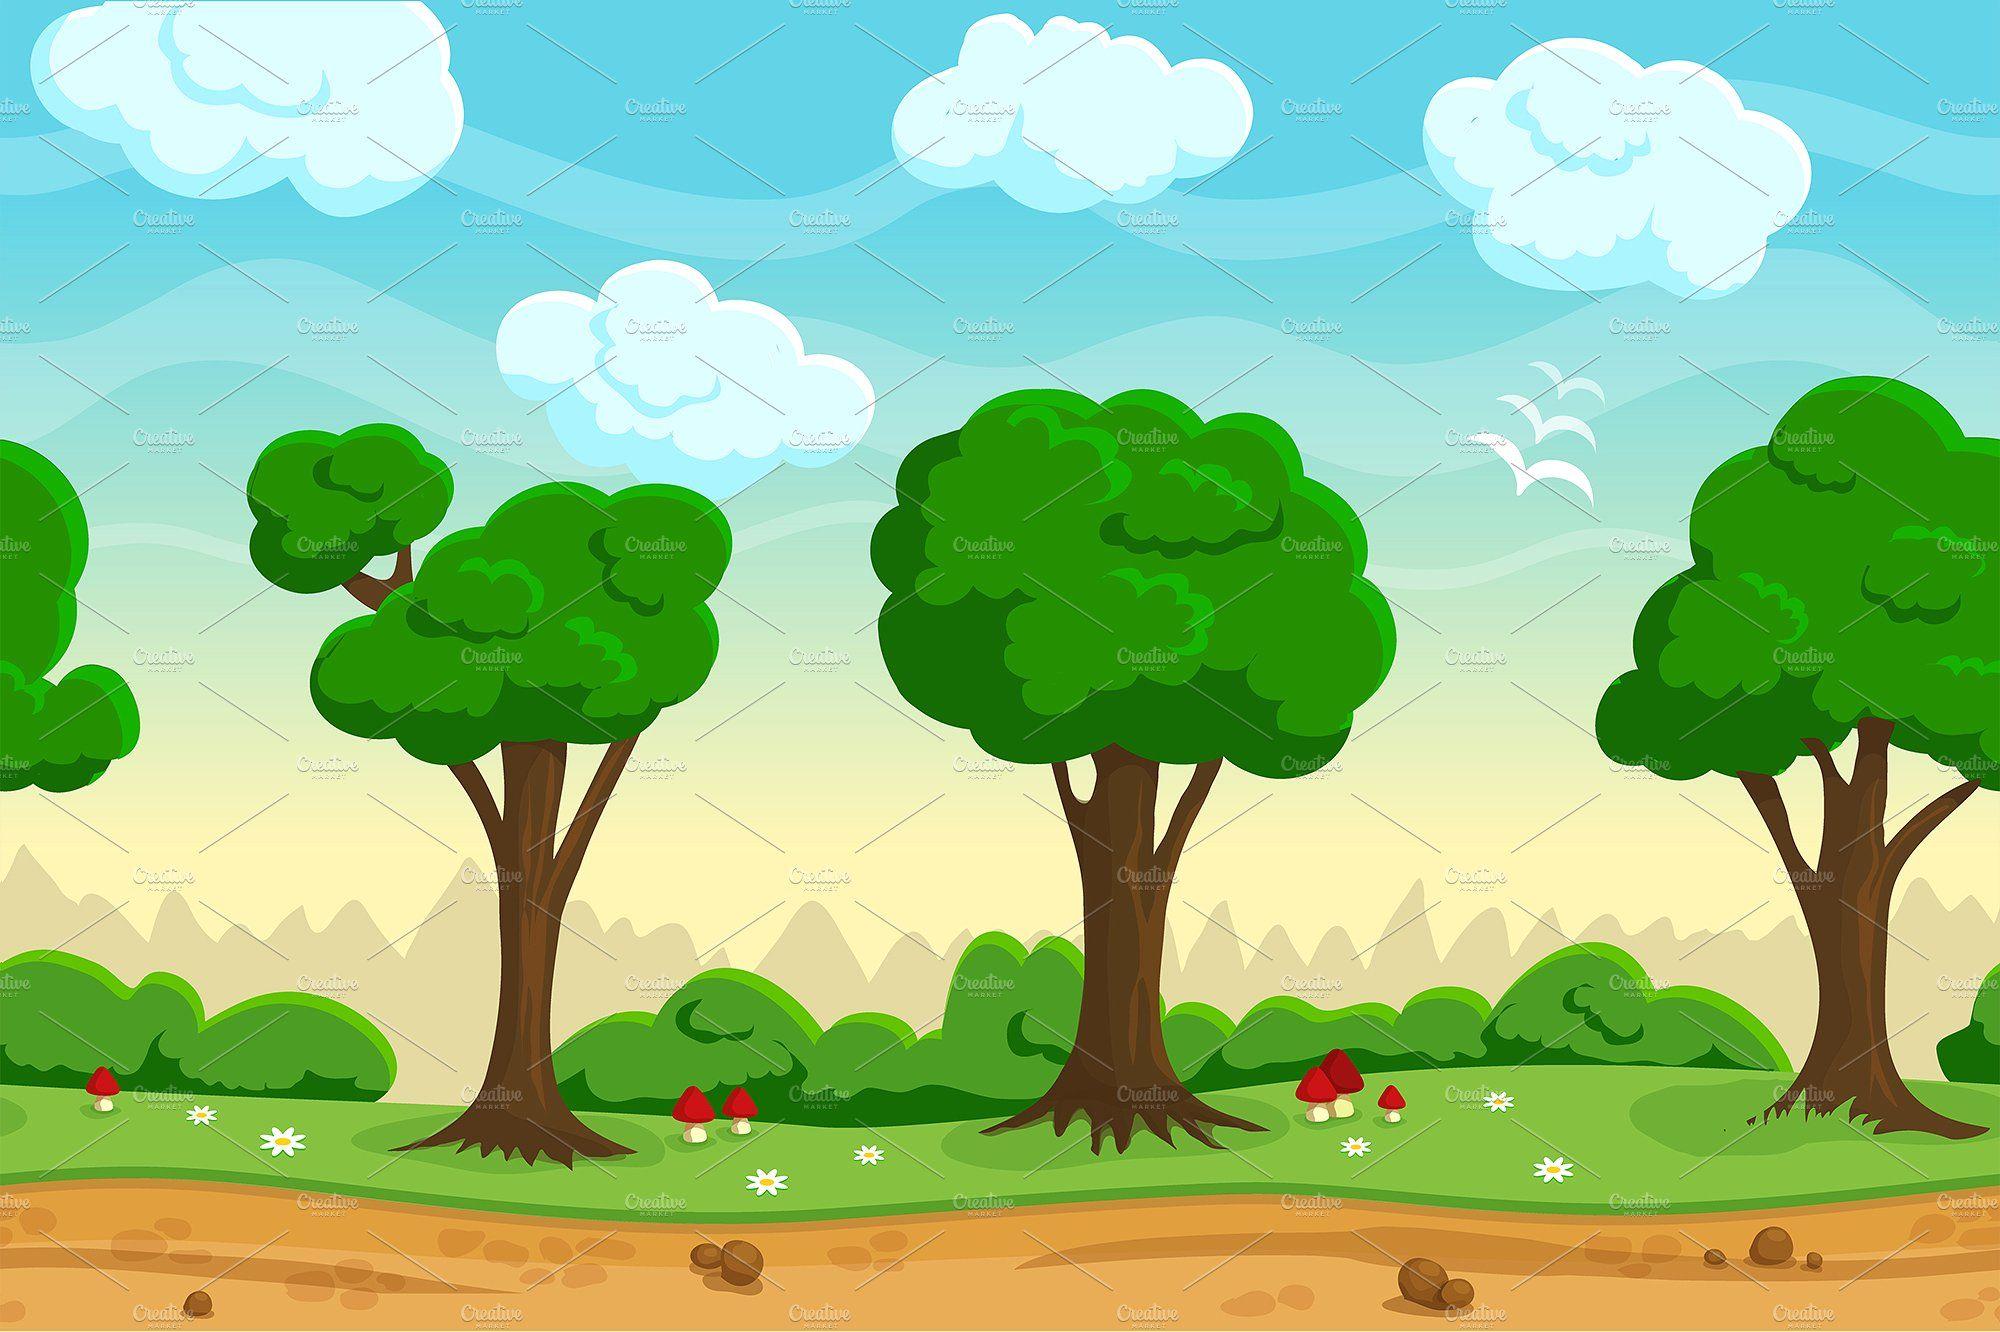 Seamless Cartoon Game Landscape Cartoon Games Nature Backgrounds Illustration Cartoon landscape with evergreen pine growing behind rocks, blue sky background. seamless cartoon game landscape